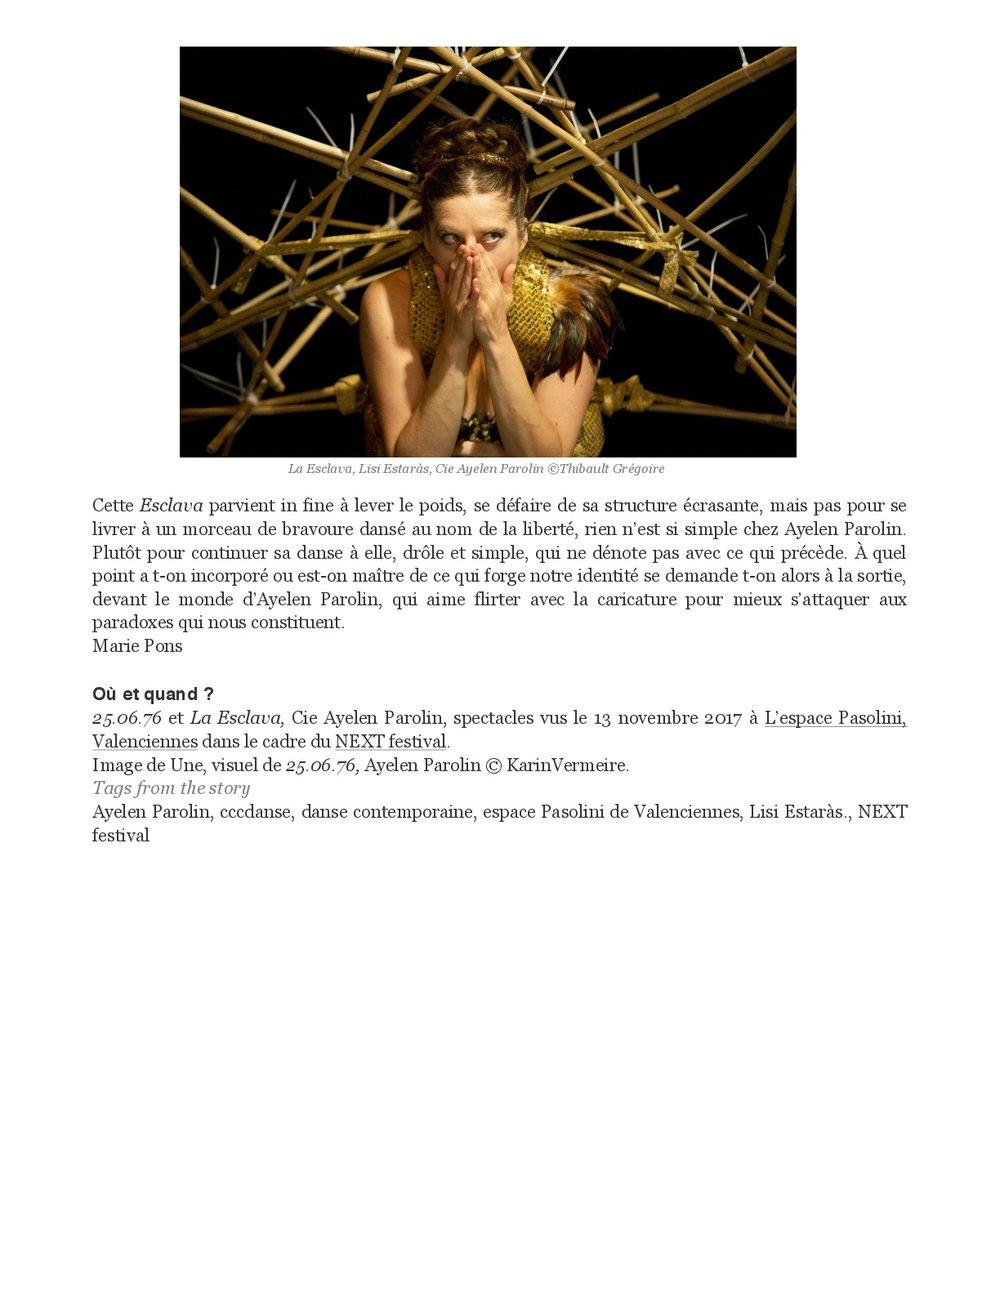 article-M.Pons-CCCDanse-005.jpg